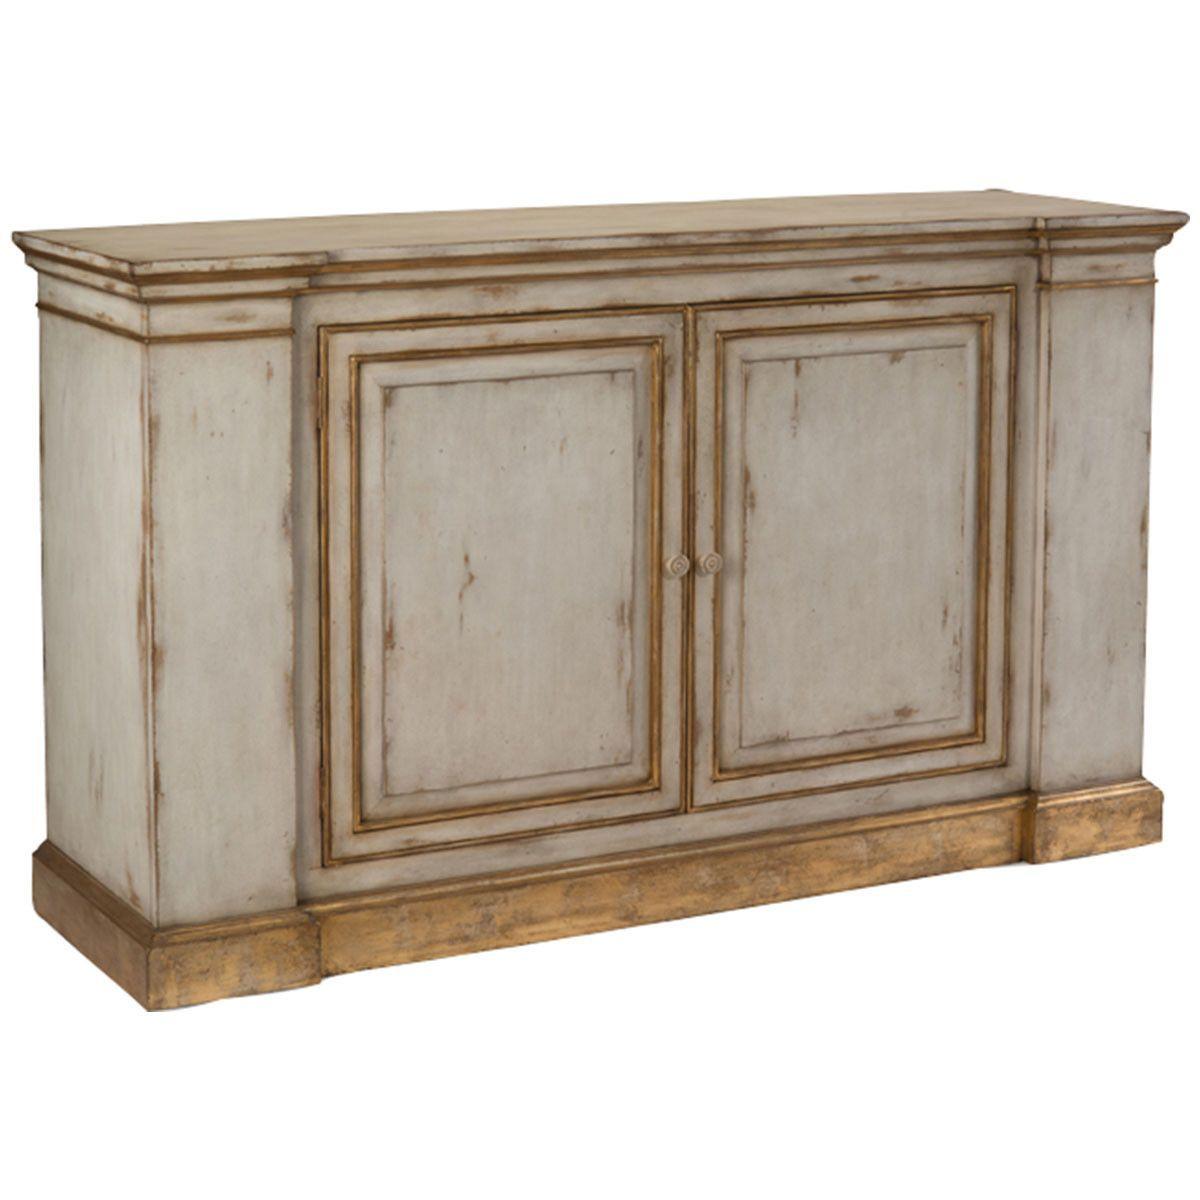 John richard carlotta cabinet shop now on pinterest pinterest